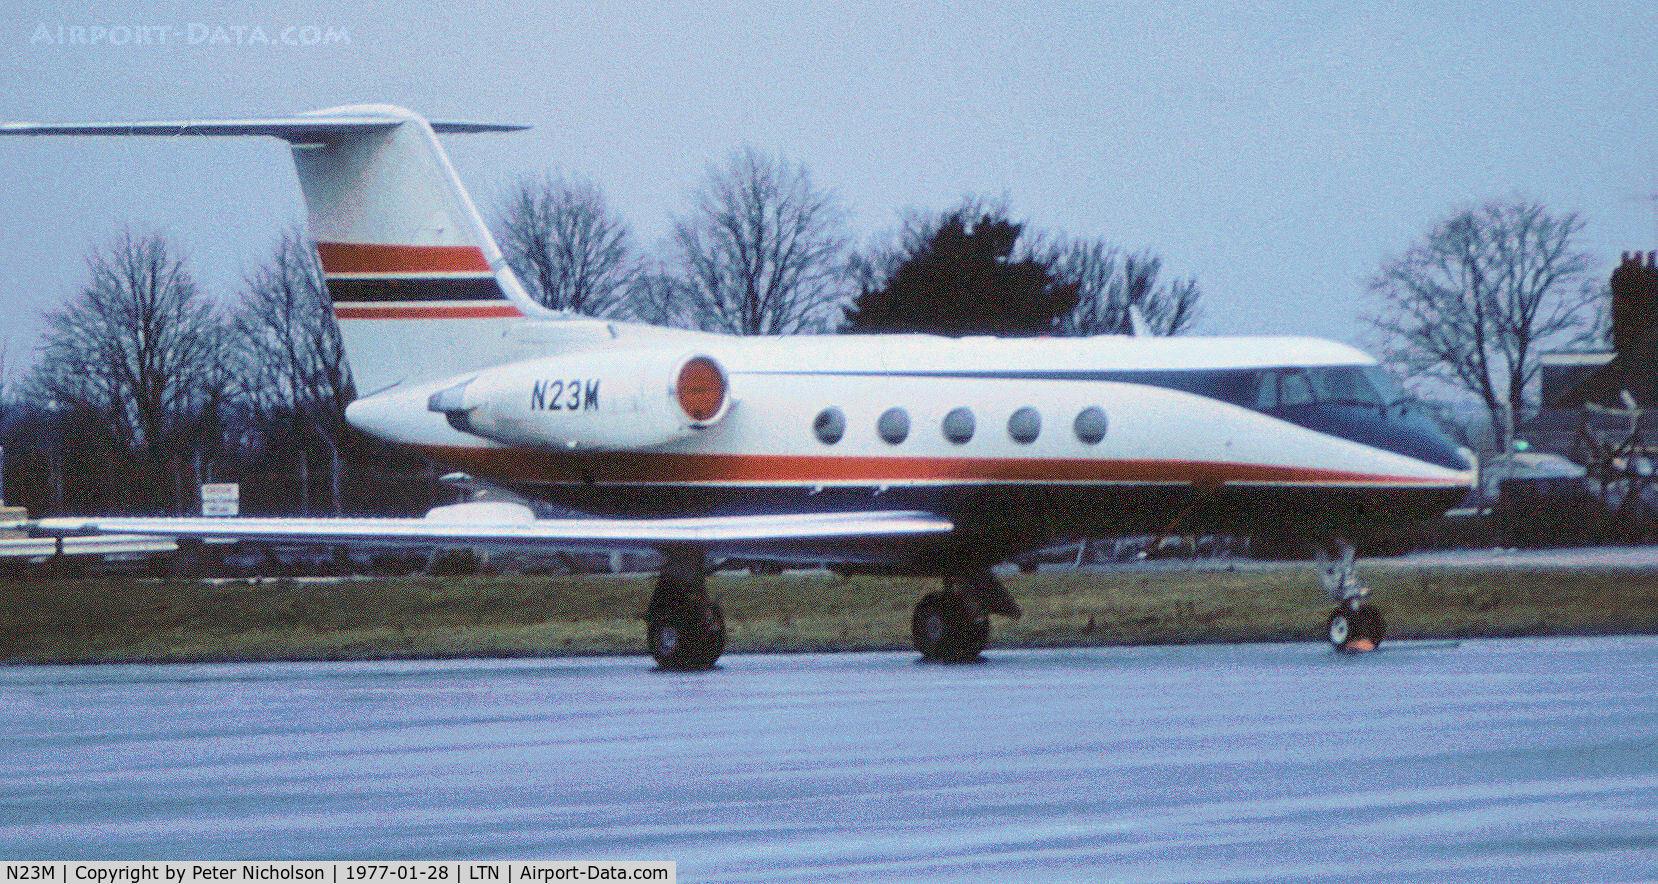 N23M, 1971 Grumman G-1159 Gulfstream II C/N 105, Gulfstream II seen at Luton in January 1977.